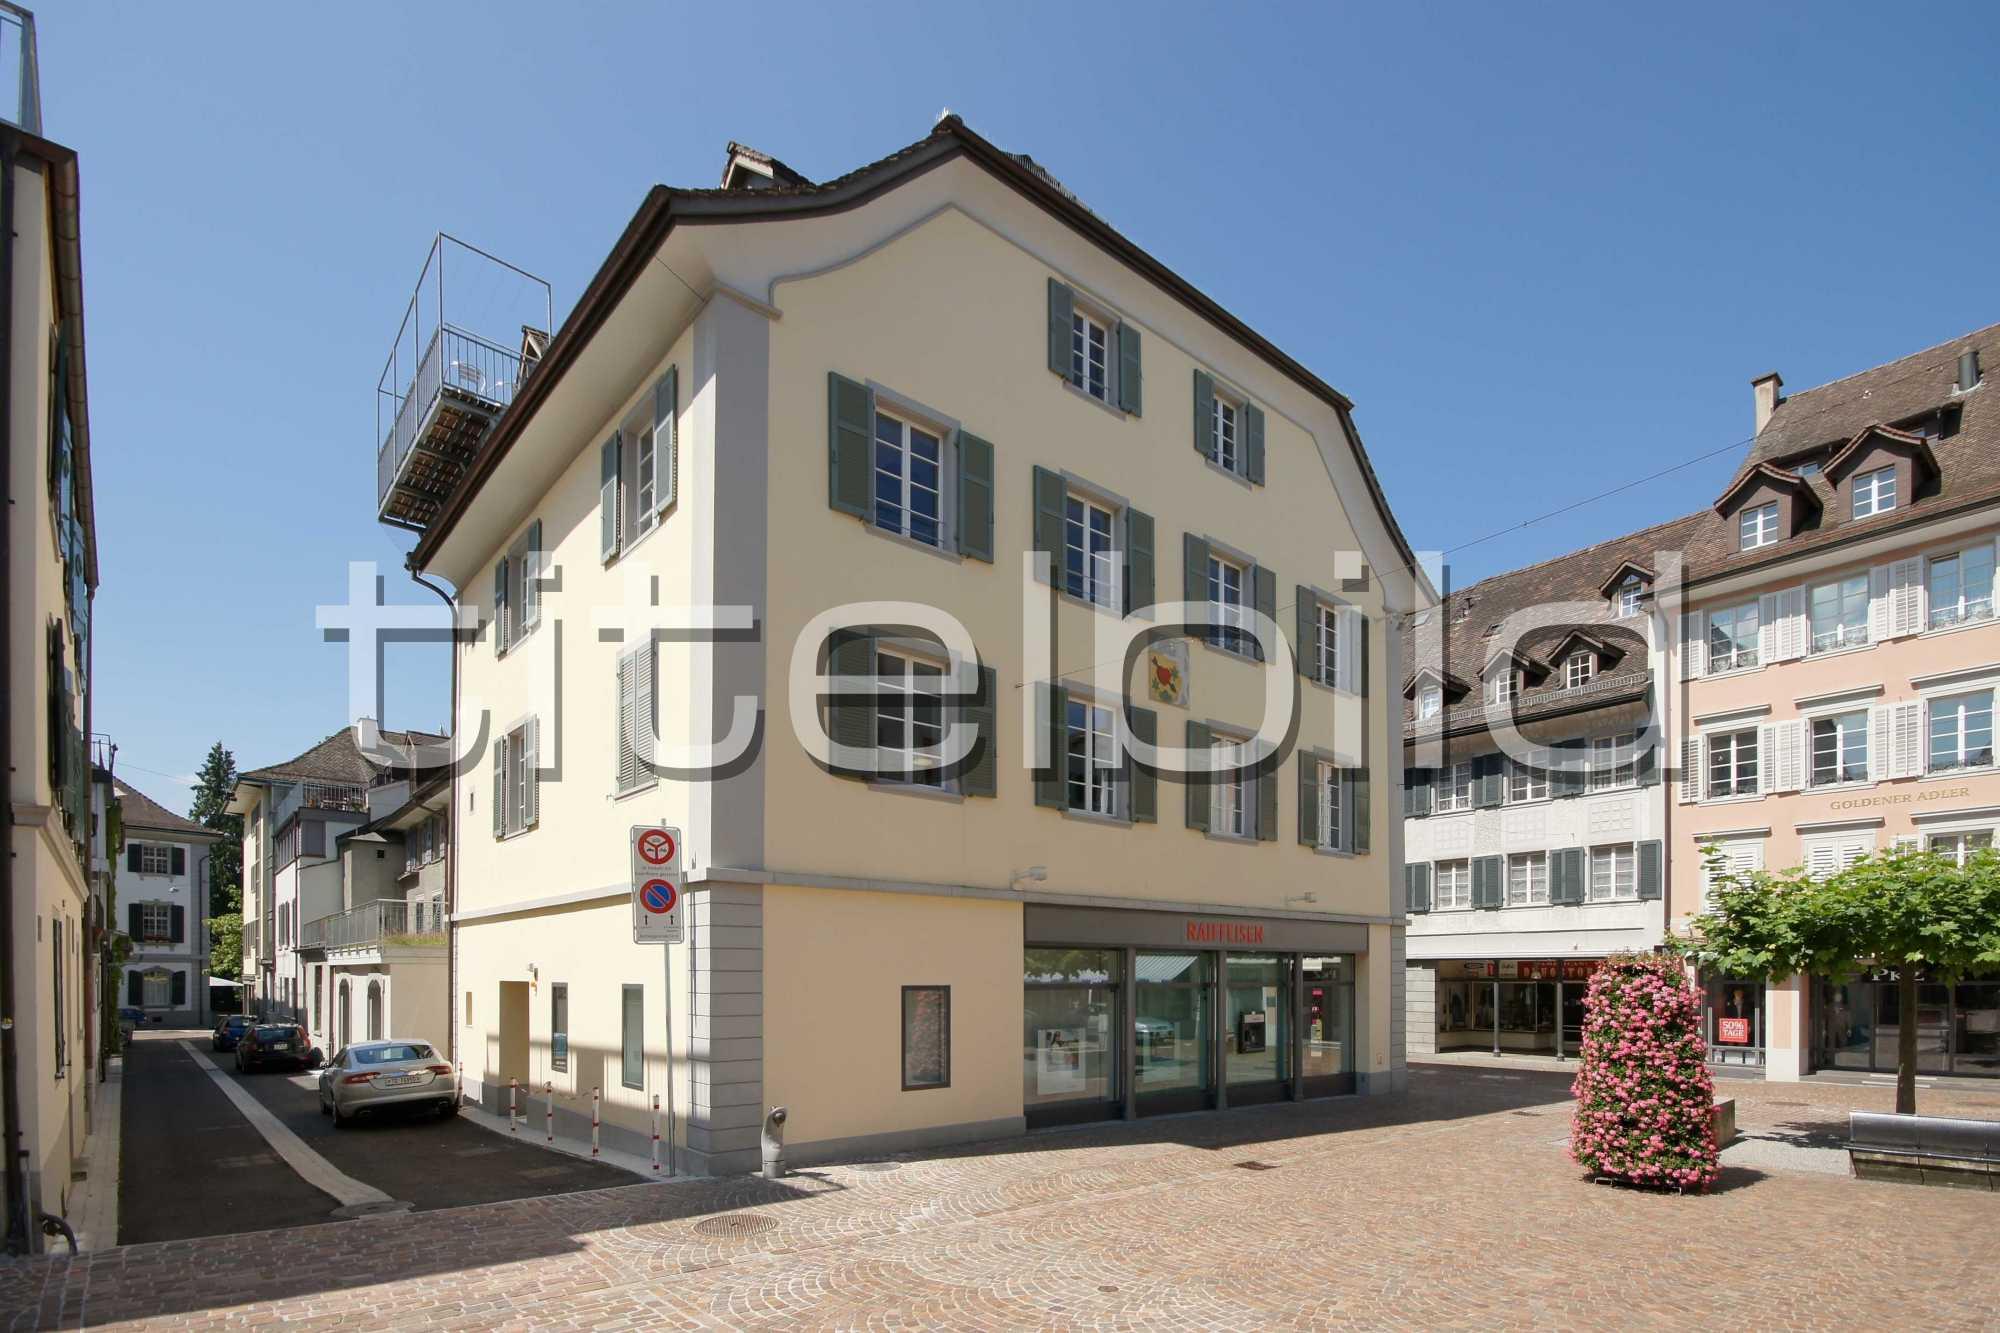 Projektbild-Nr. 1: Bankgebäude der Raiffeisenbank Frauenfeld